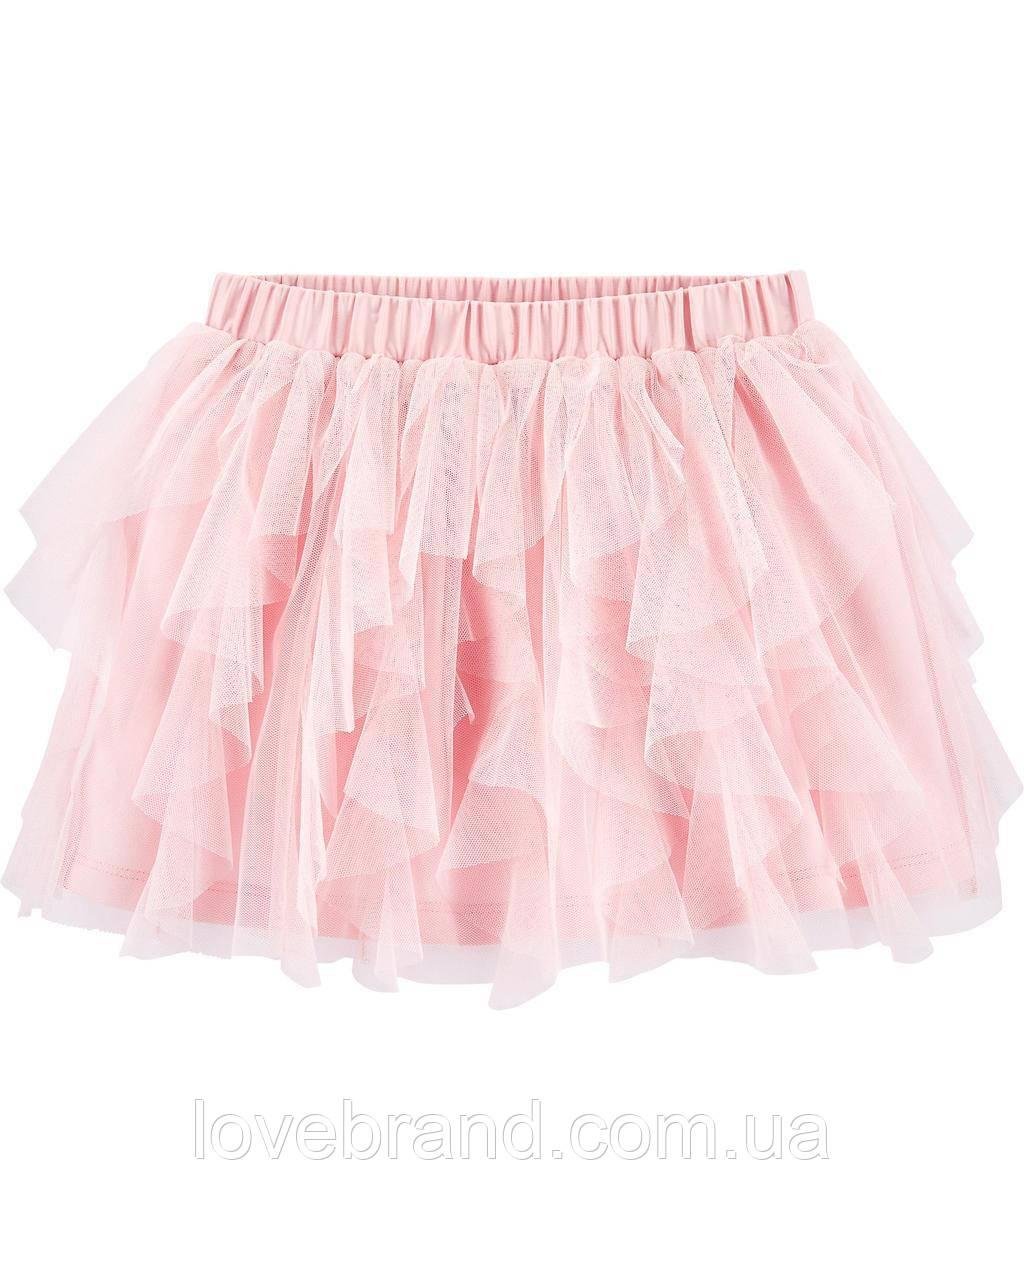 Пышная фатиновая юбка для девочки OshKosh, розовая юбочка туту